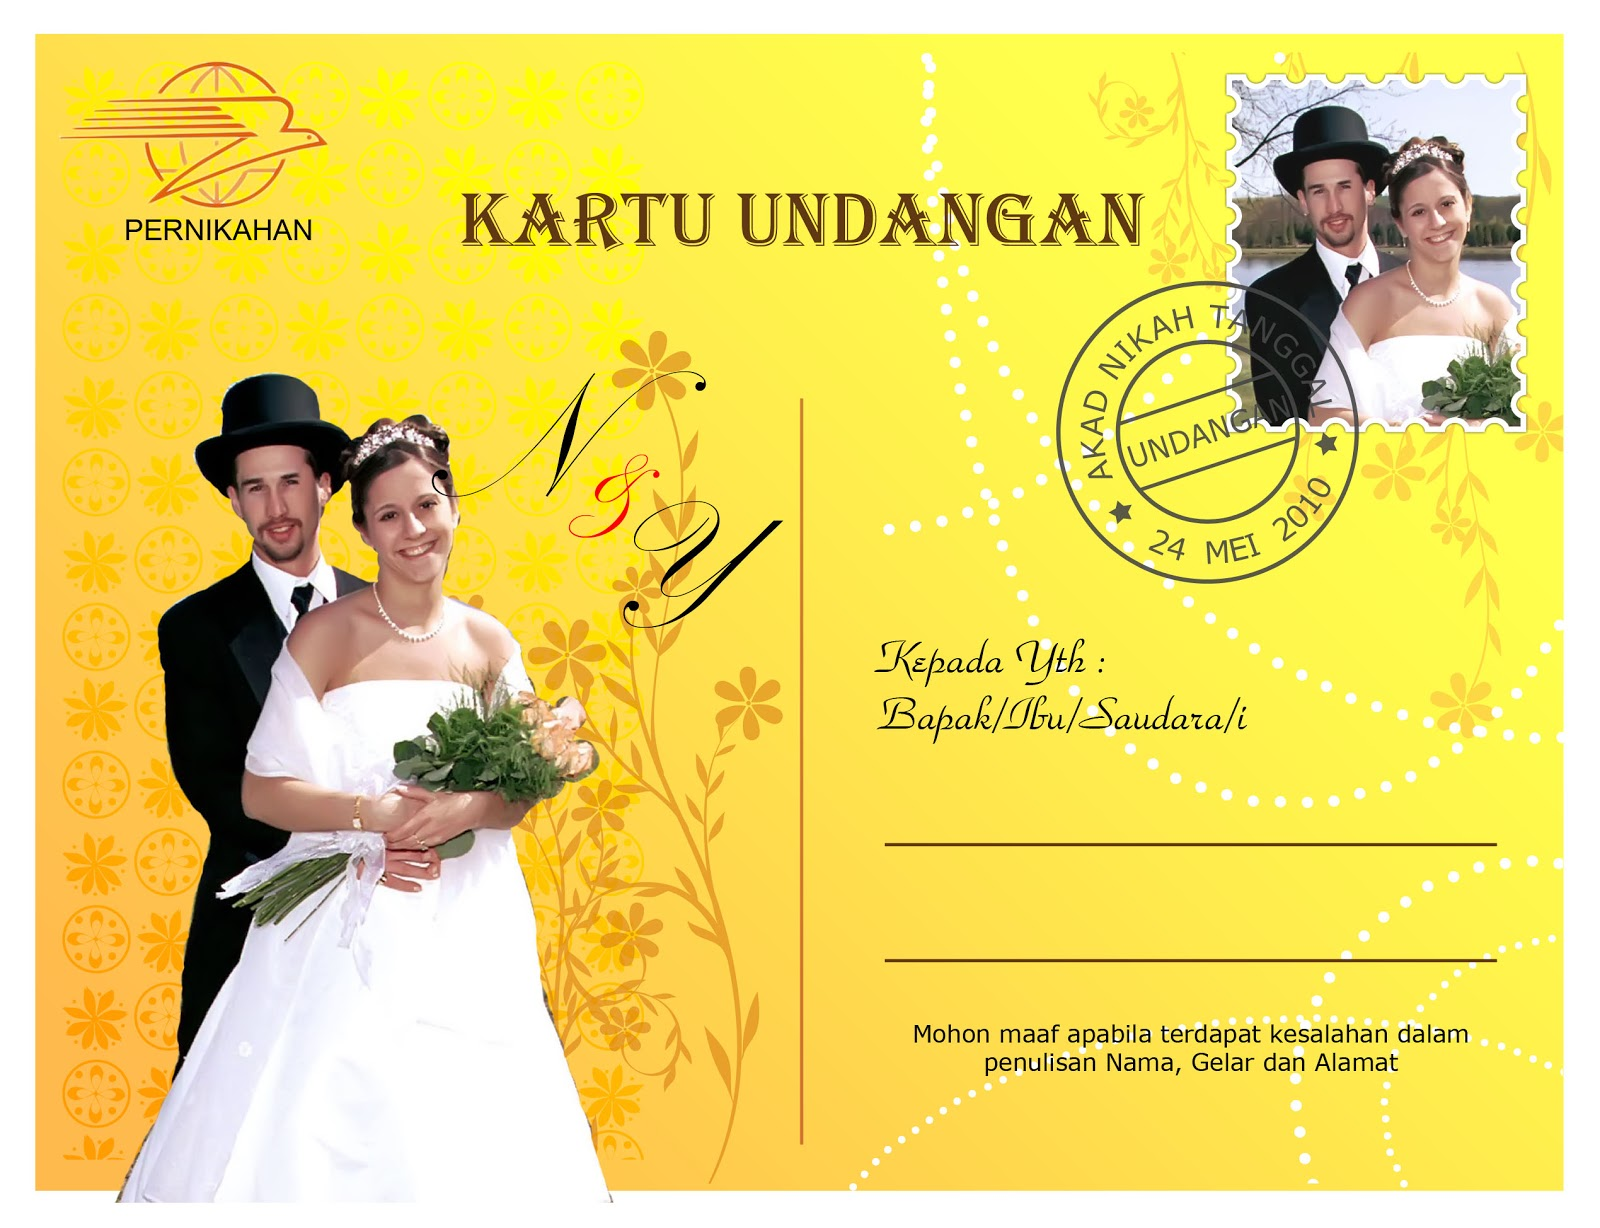 Undangan Pernikahan Group Picture Image Tag Bingkai Undangan